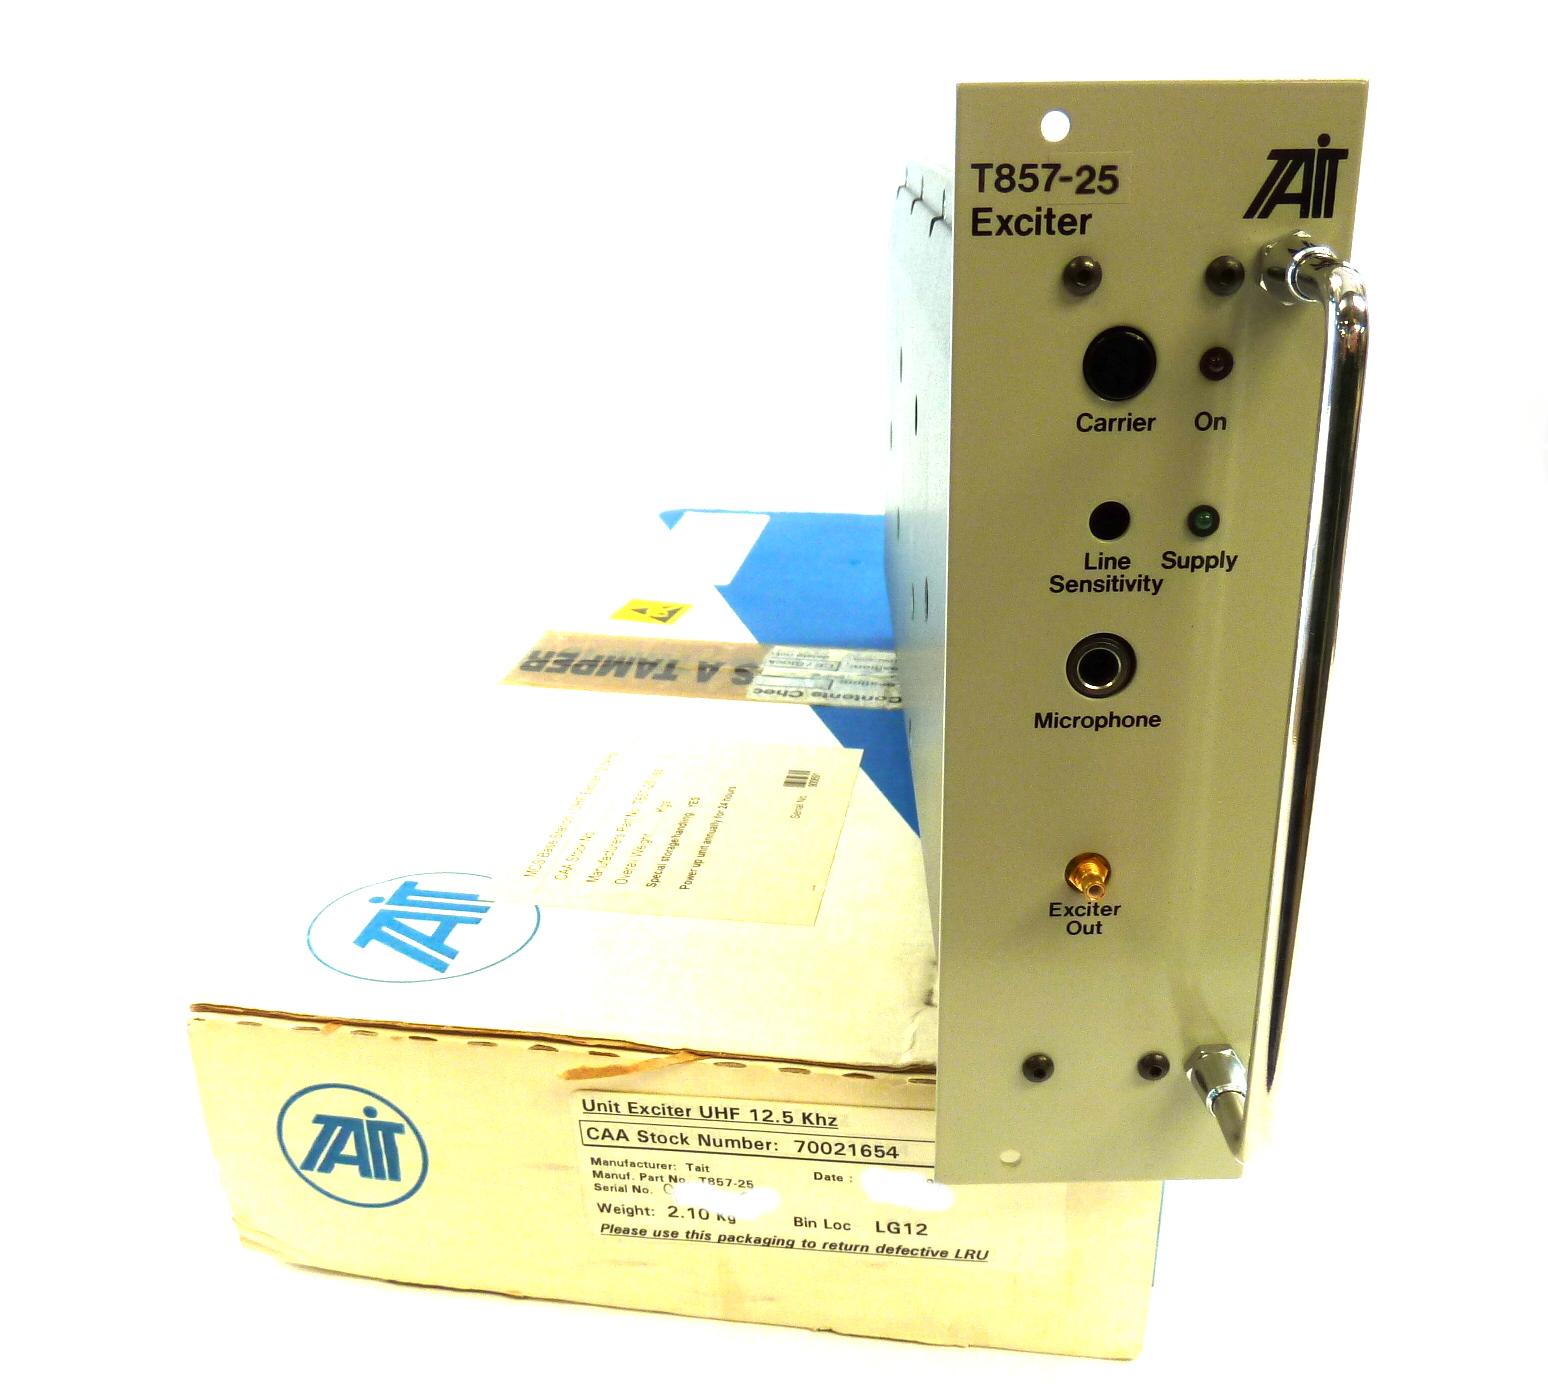 Tait T857-25 Modular Aerospace Radio Repeater Exciter UHF 12 5KHz  (Unprogrammed)